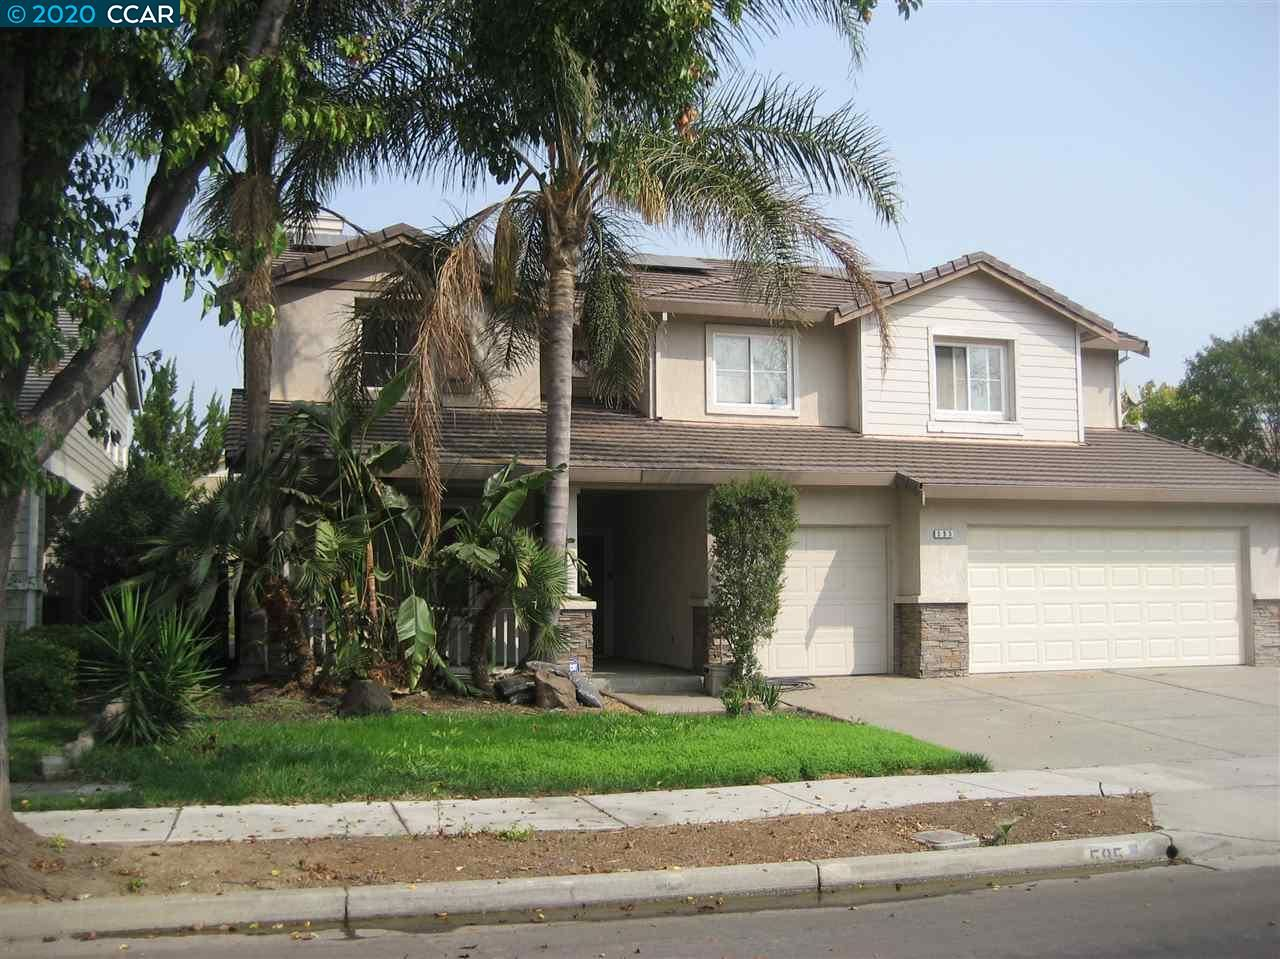 595 Bartlett Ct, Brentwood, CA 94513 - MLS#: 40922328